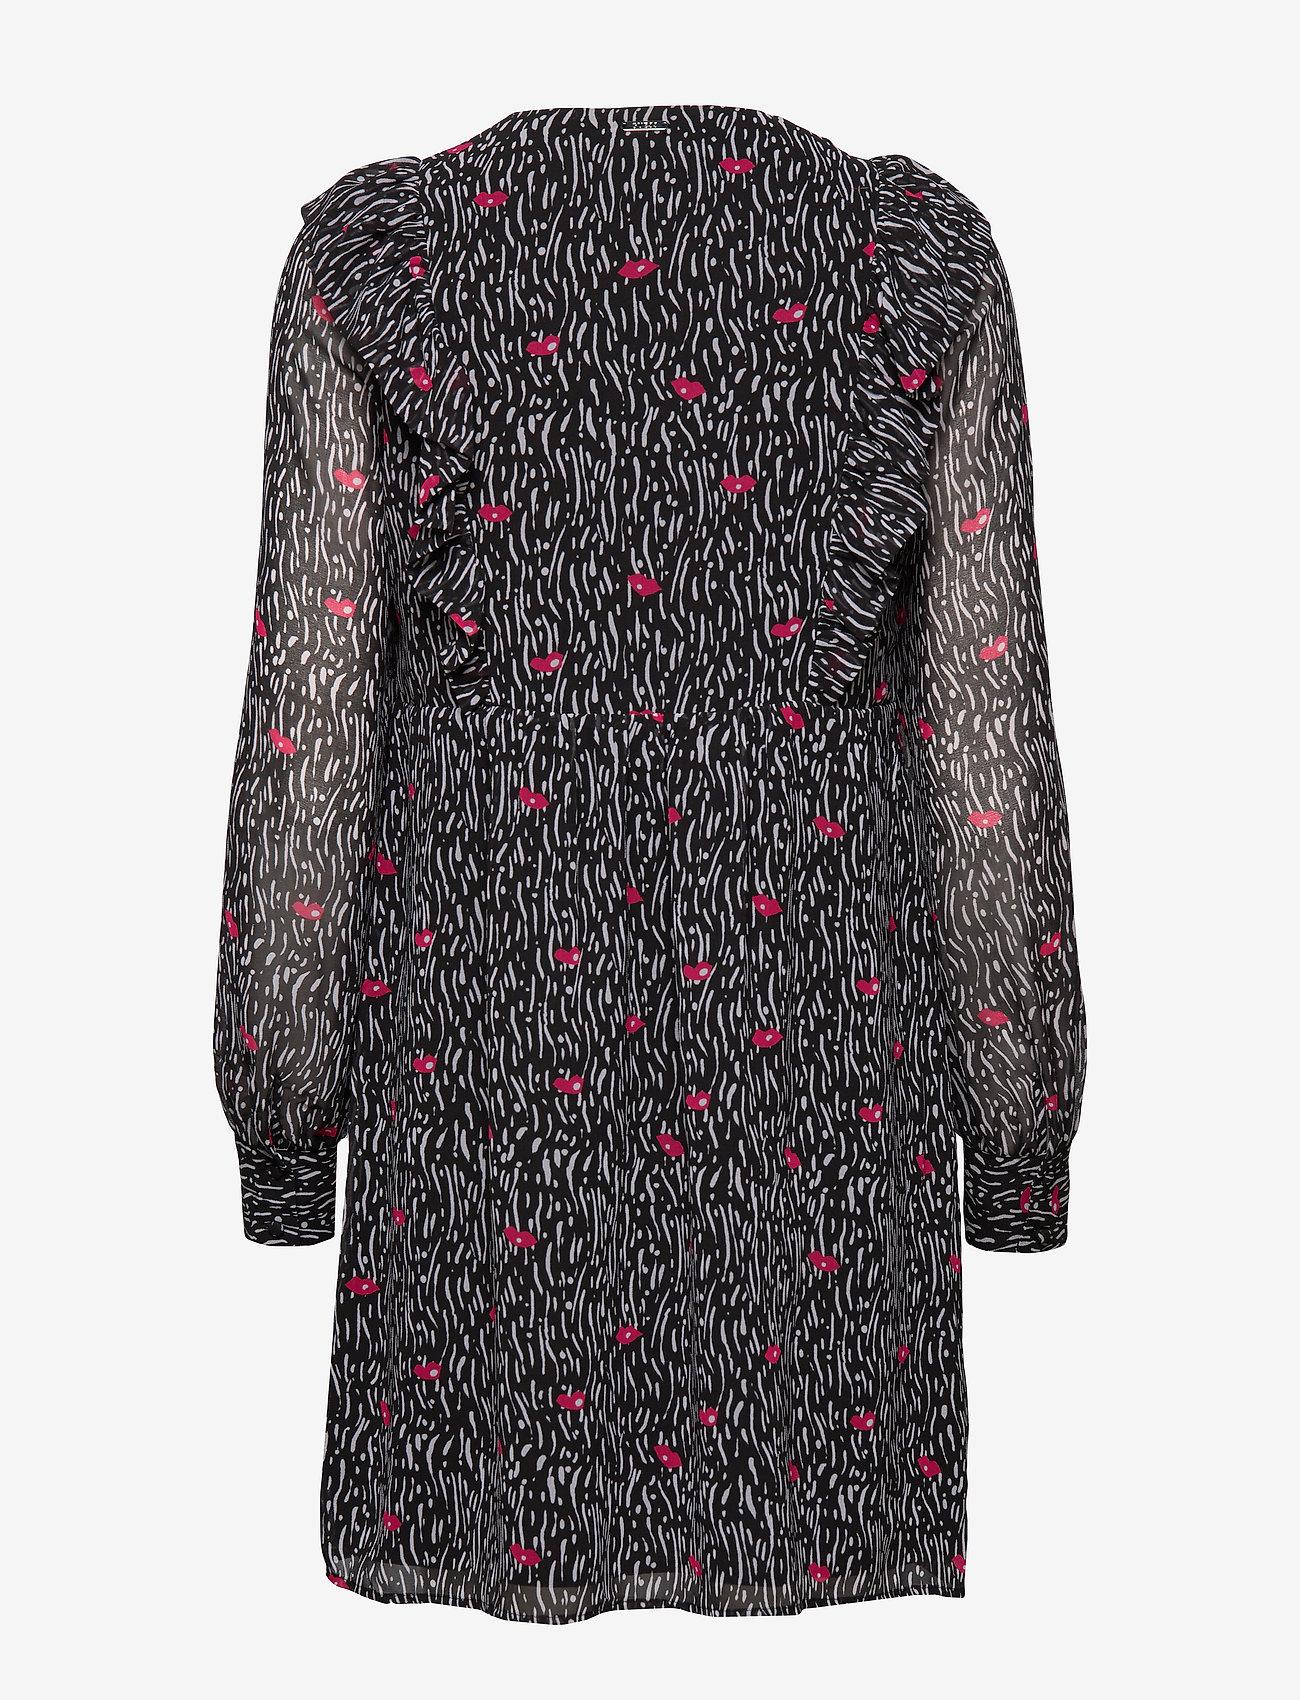 GUESS Jeans - JOHARA DRESS - krótkie sukienki - lips and lines bl - 1